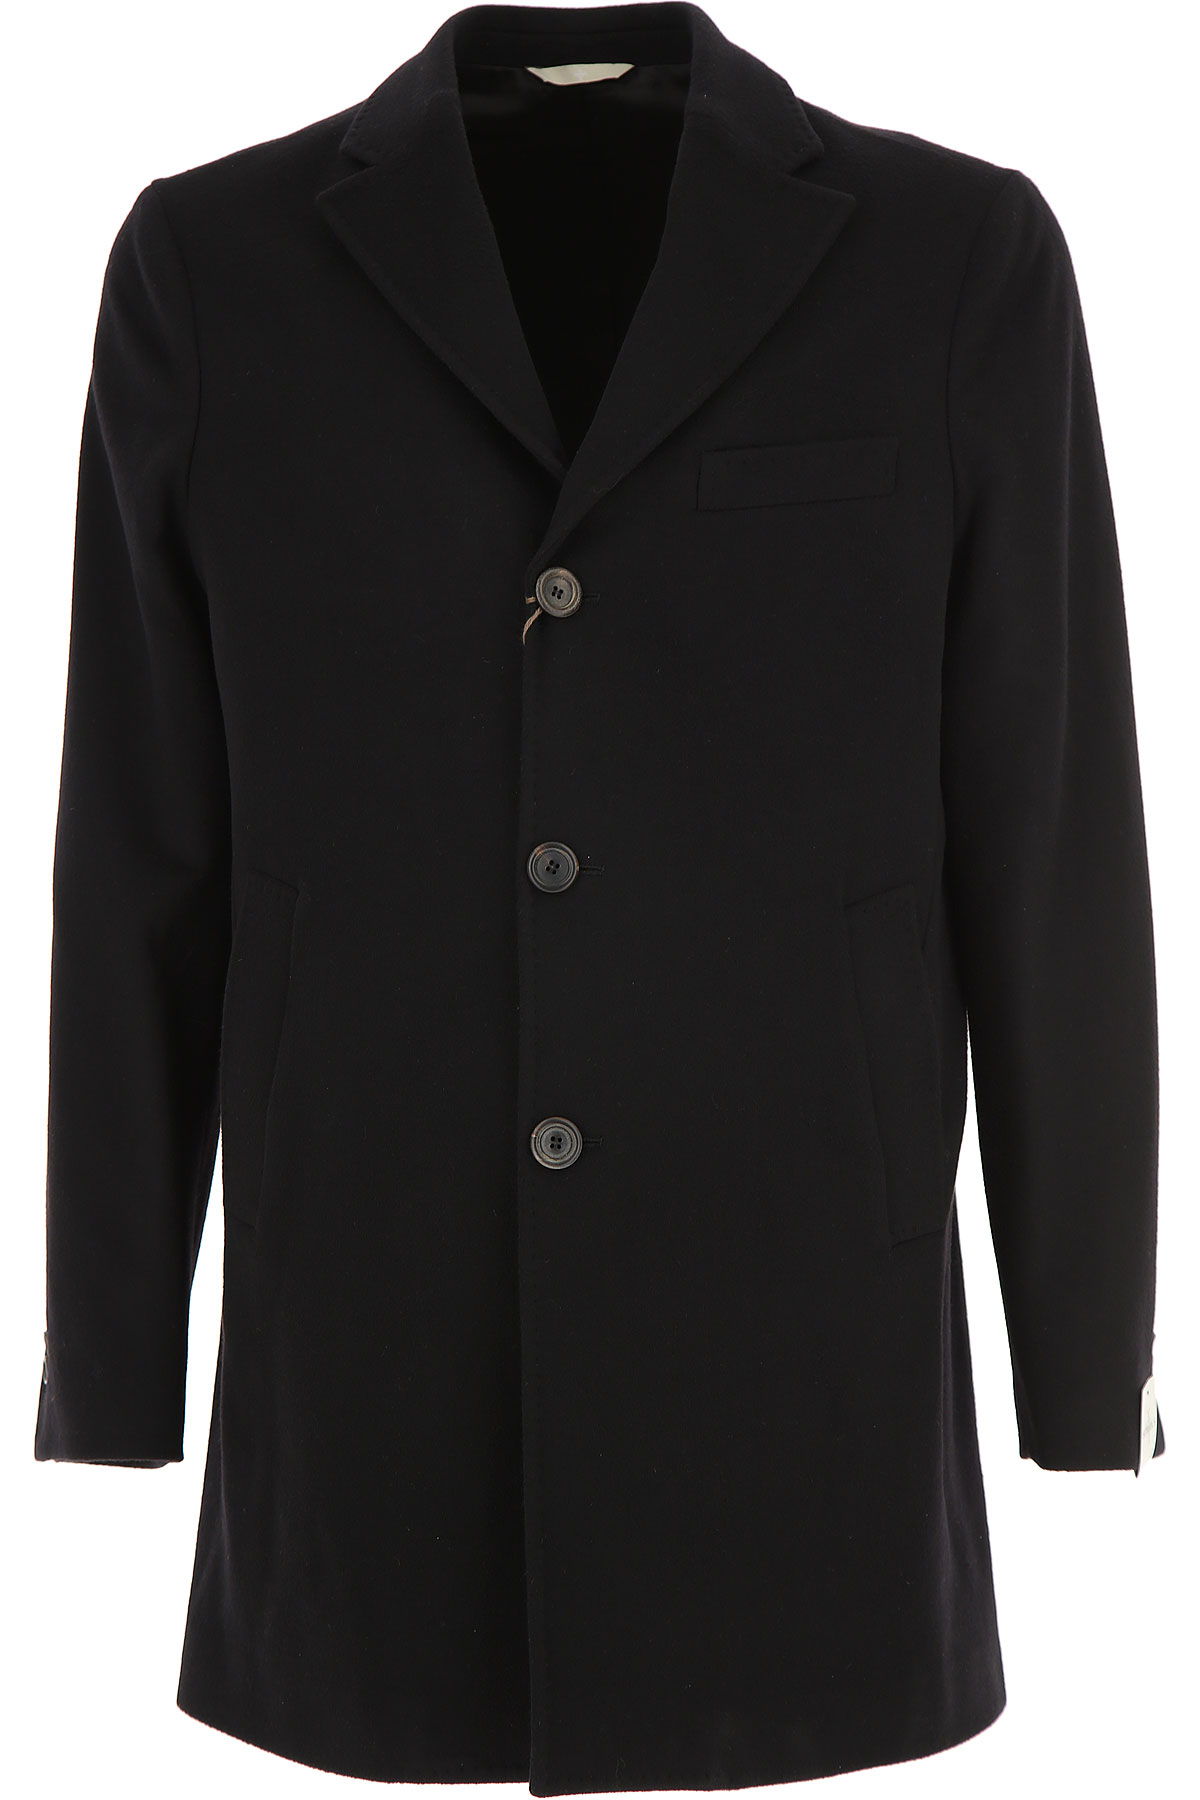 Image of Simbols Men\'s Coat, Black, Wool, 2017, L S XL XXL